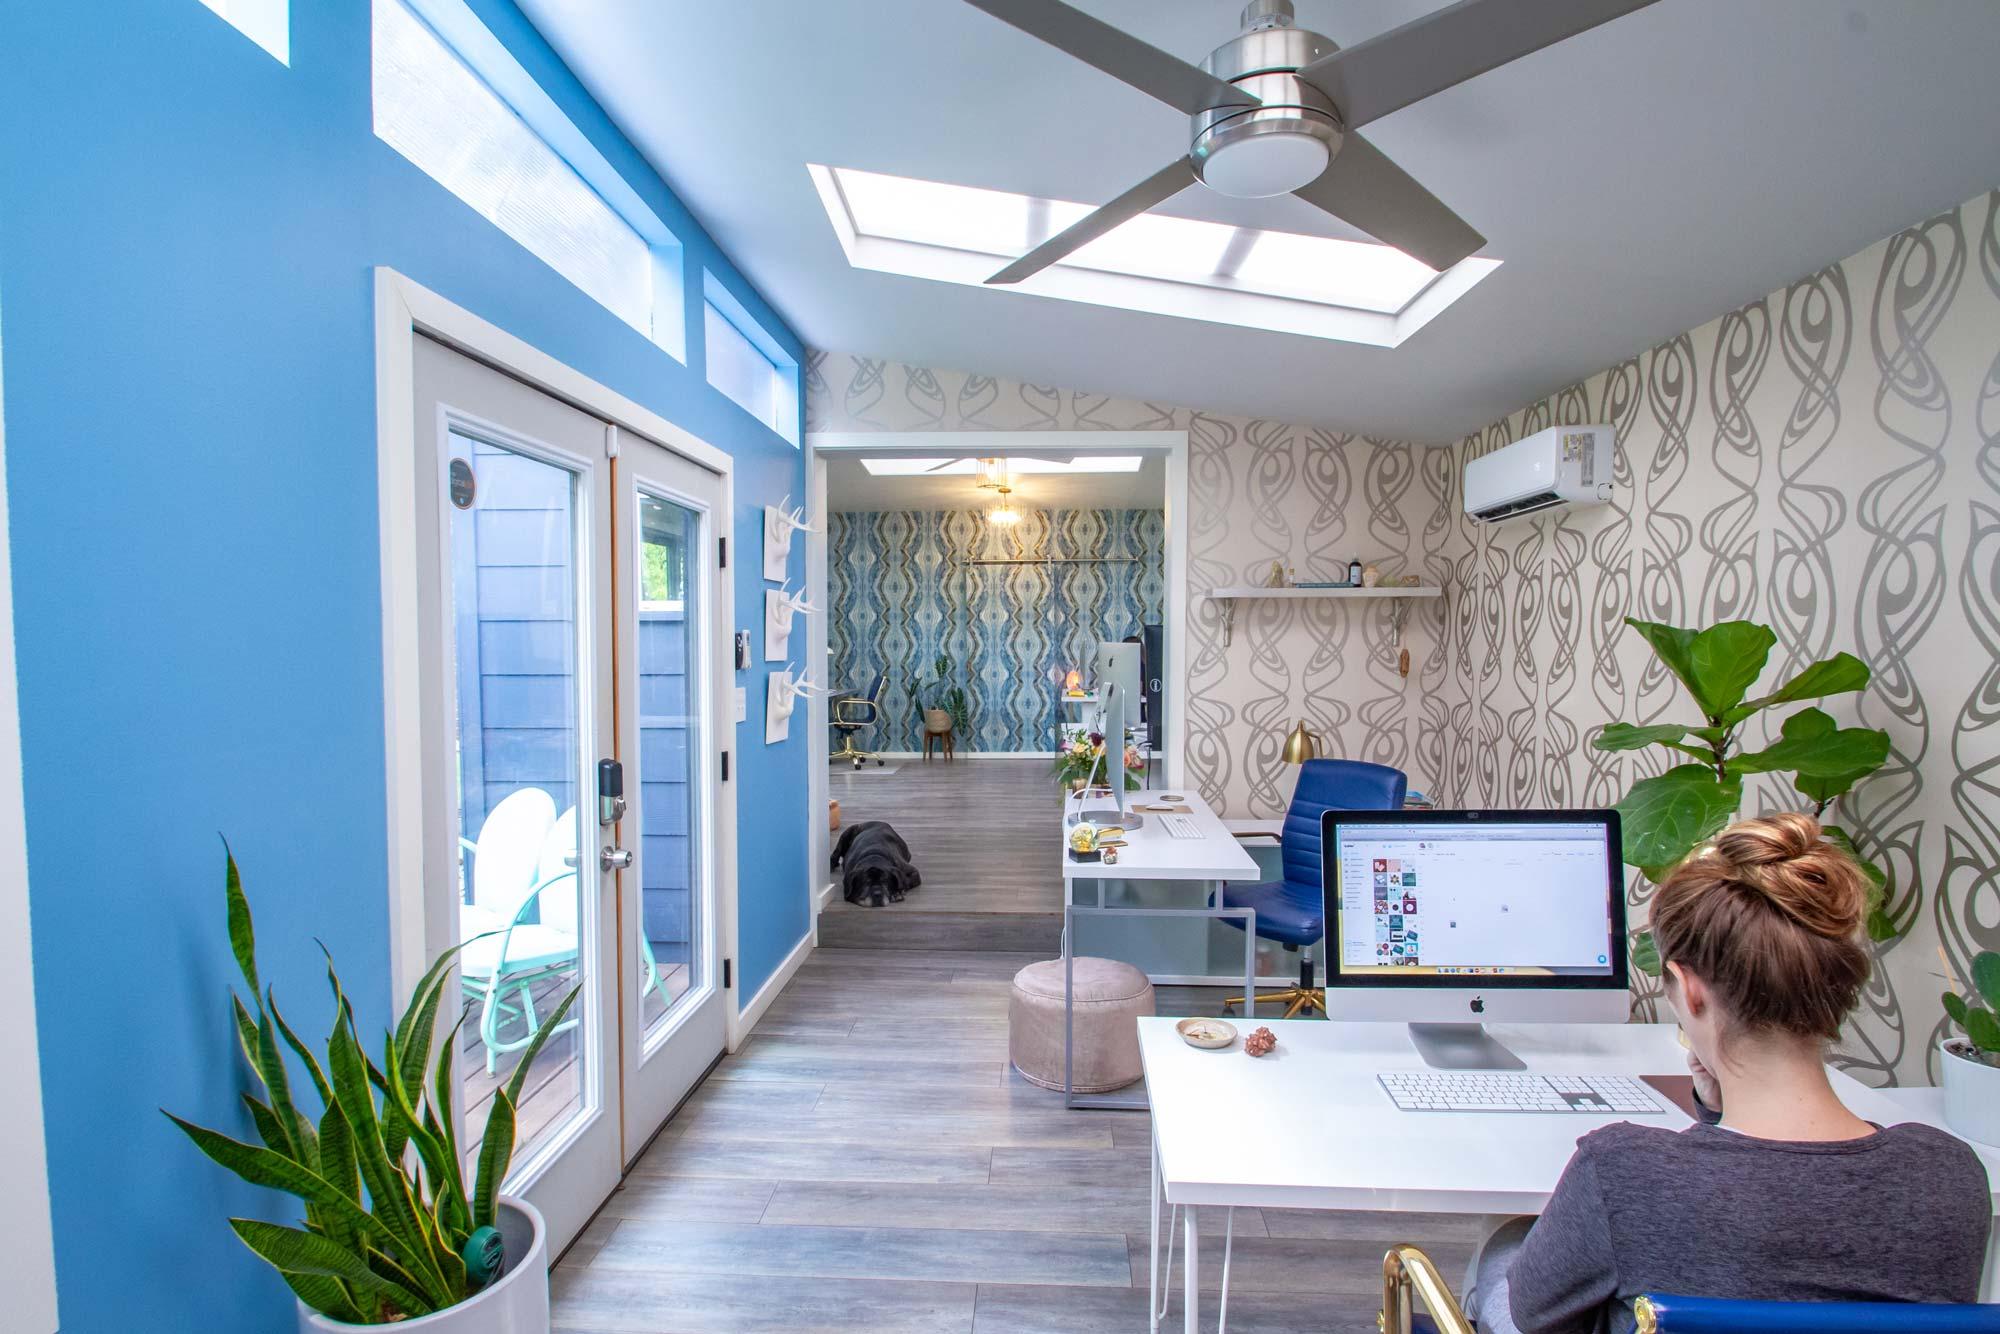 DesignGood HQ blue room